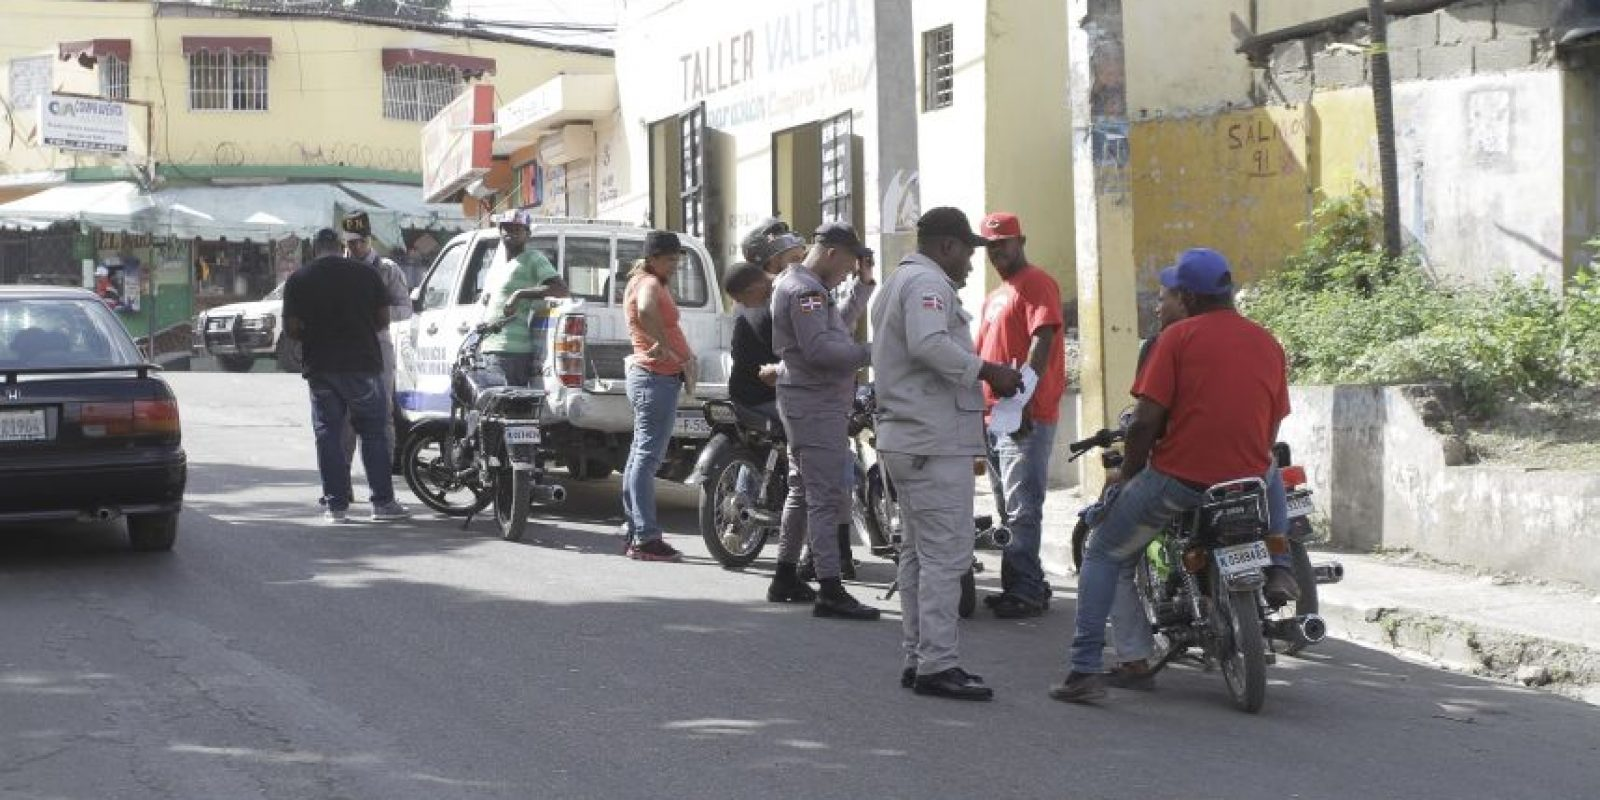 Agentes policiales presentes de manera esporádica. Foto:Roberto Guzmán